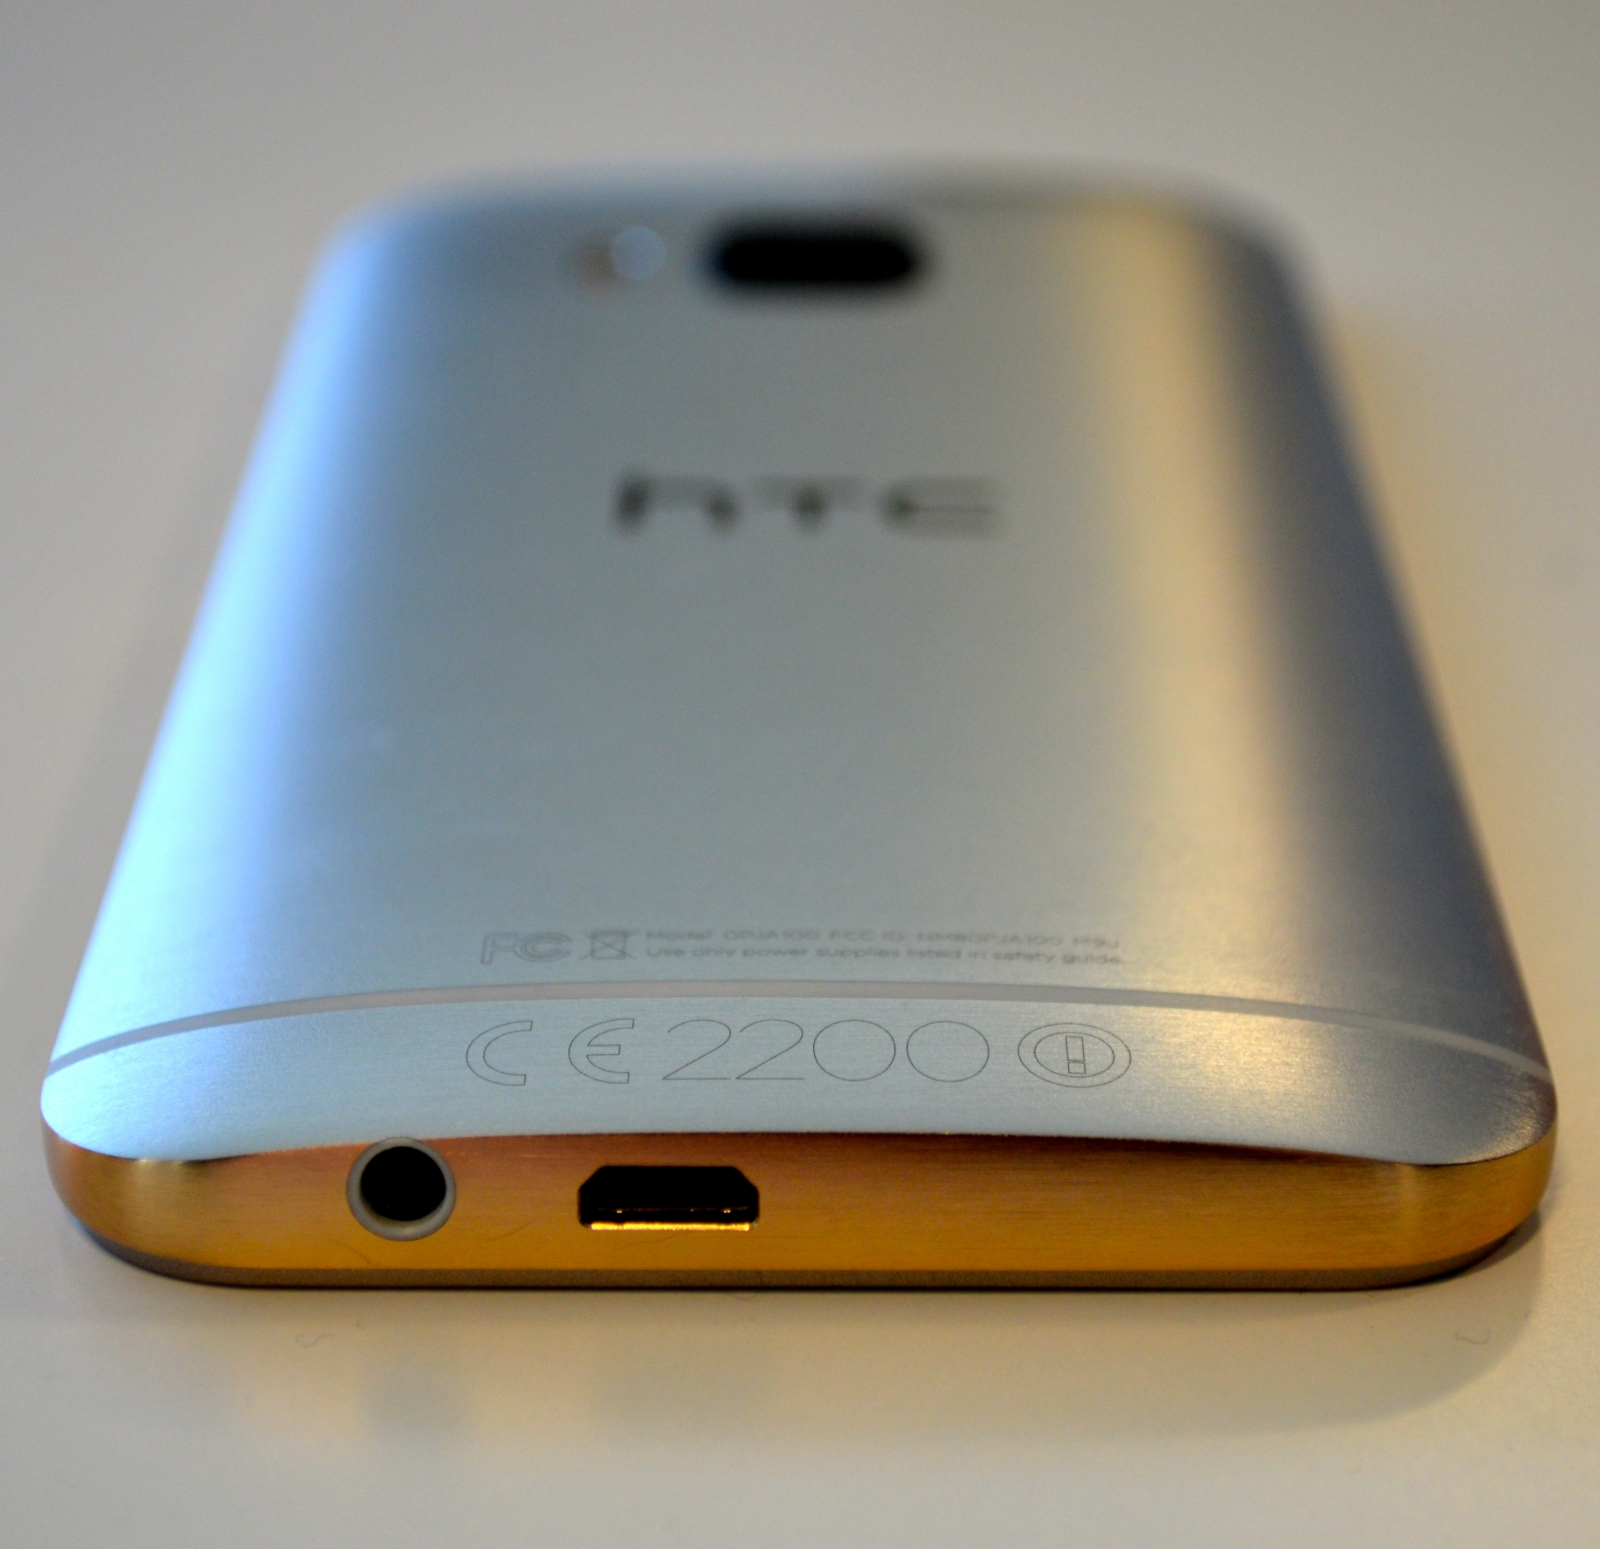 HTC One M9 shot